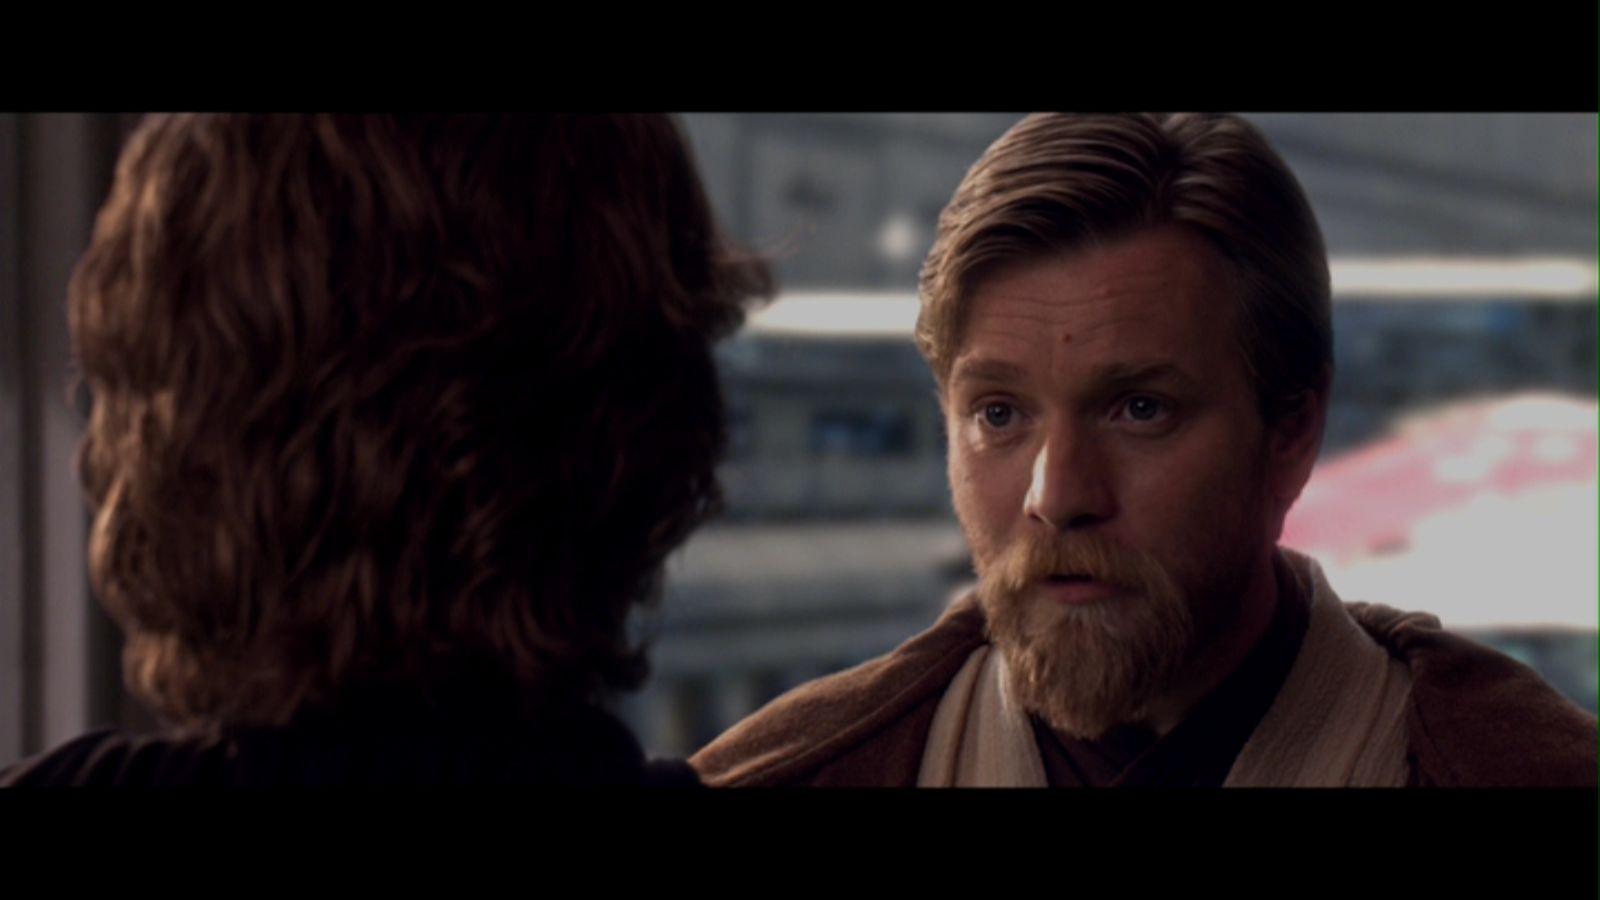 Obi Wan Kenobi Actor Obi-Wan Kenobi